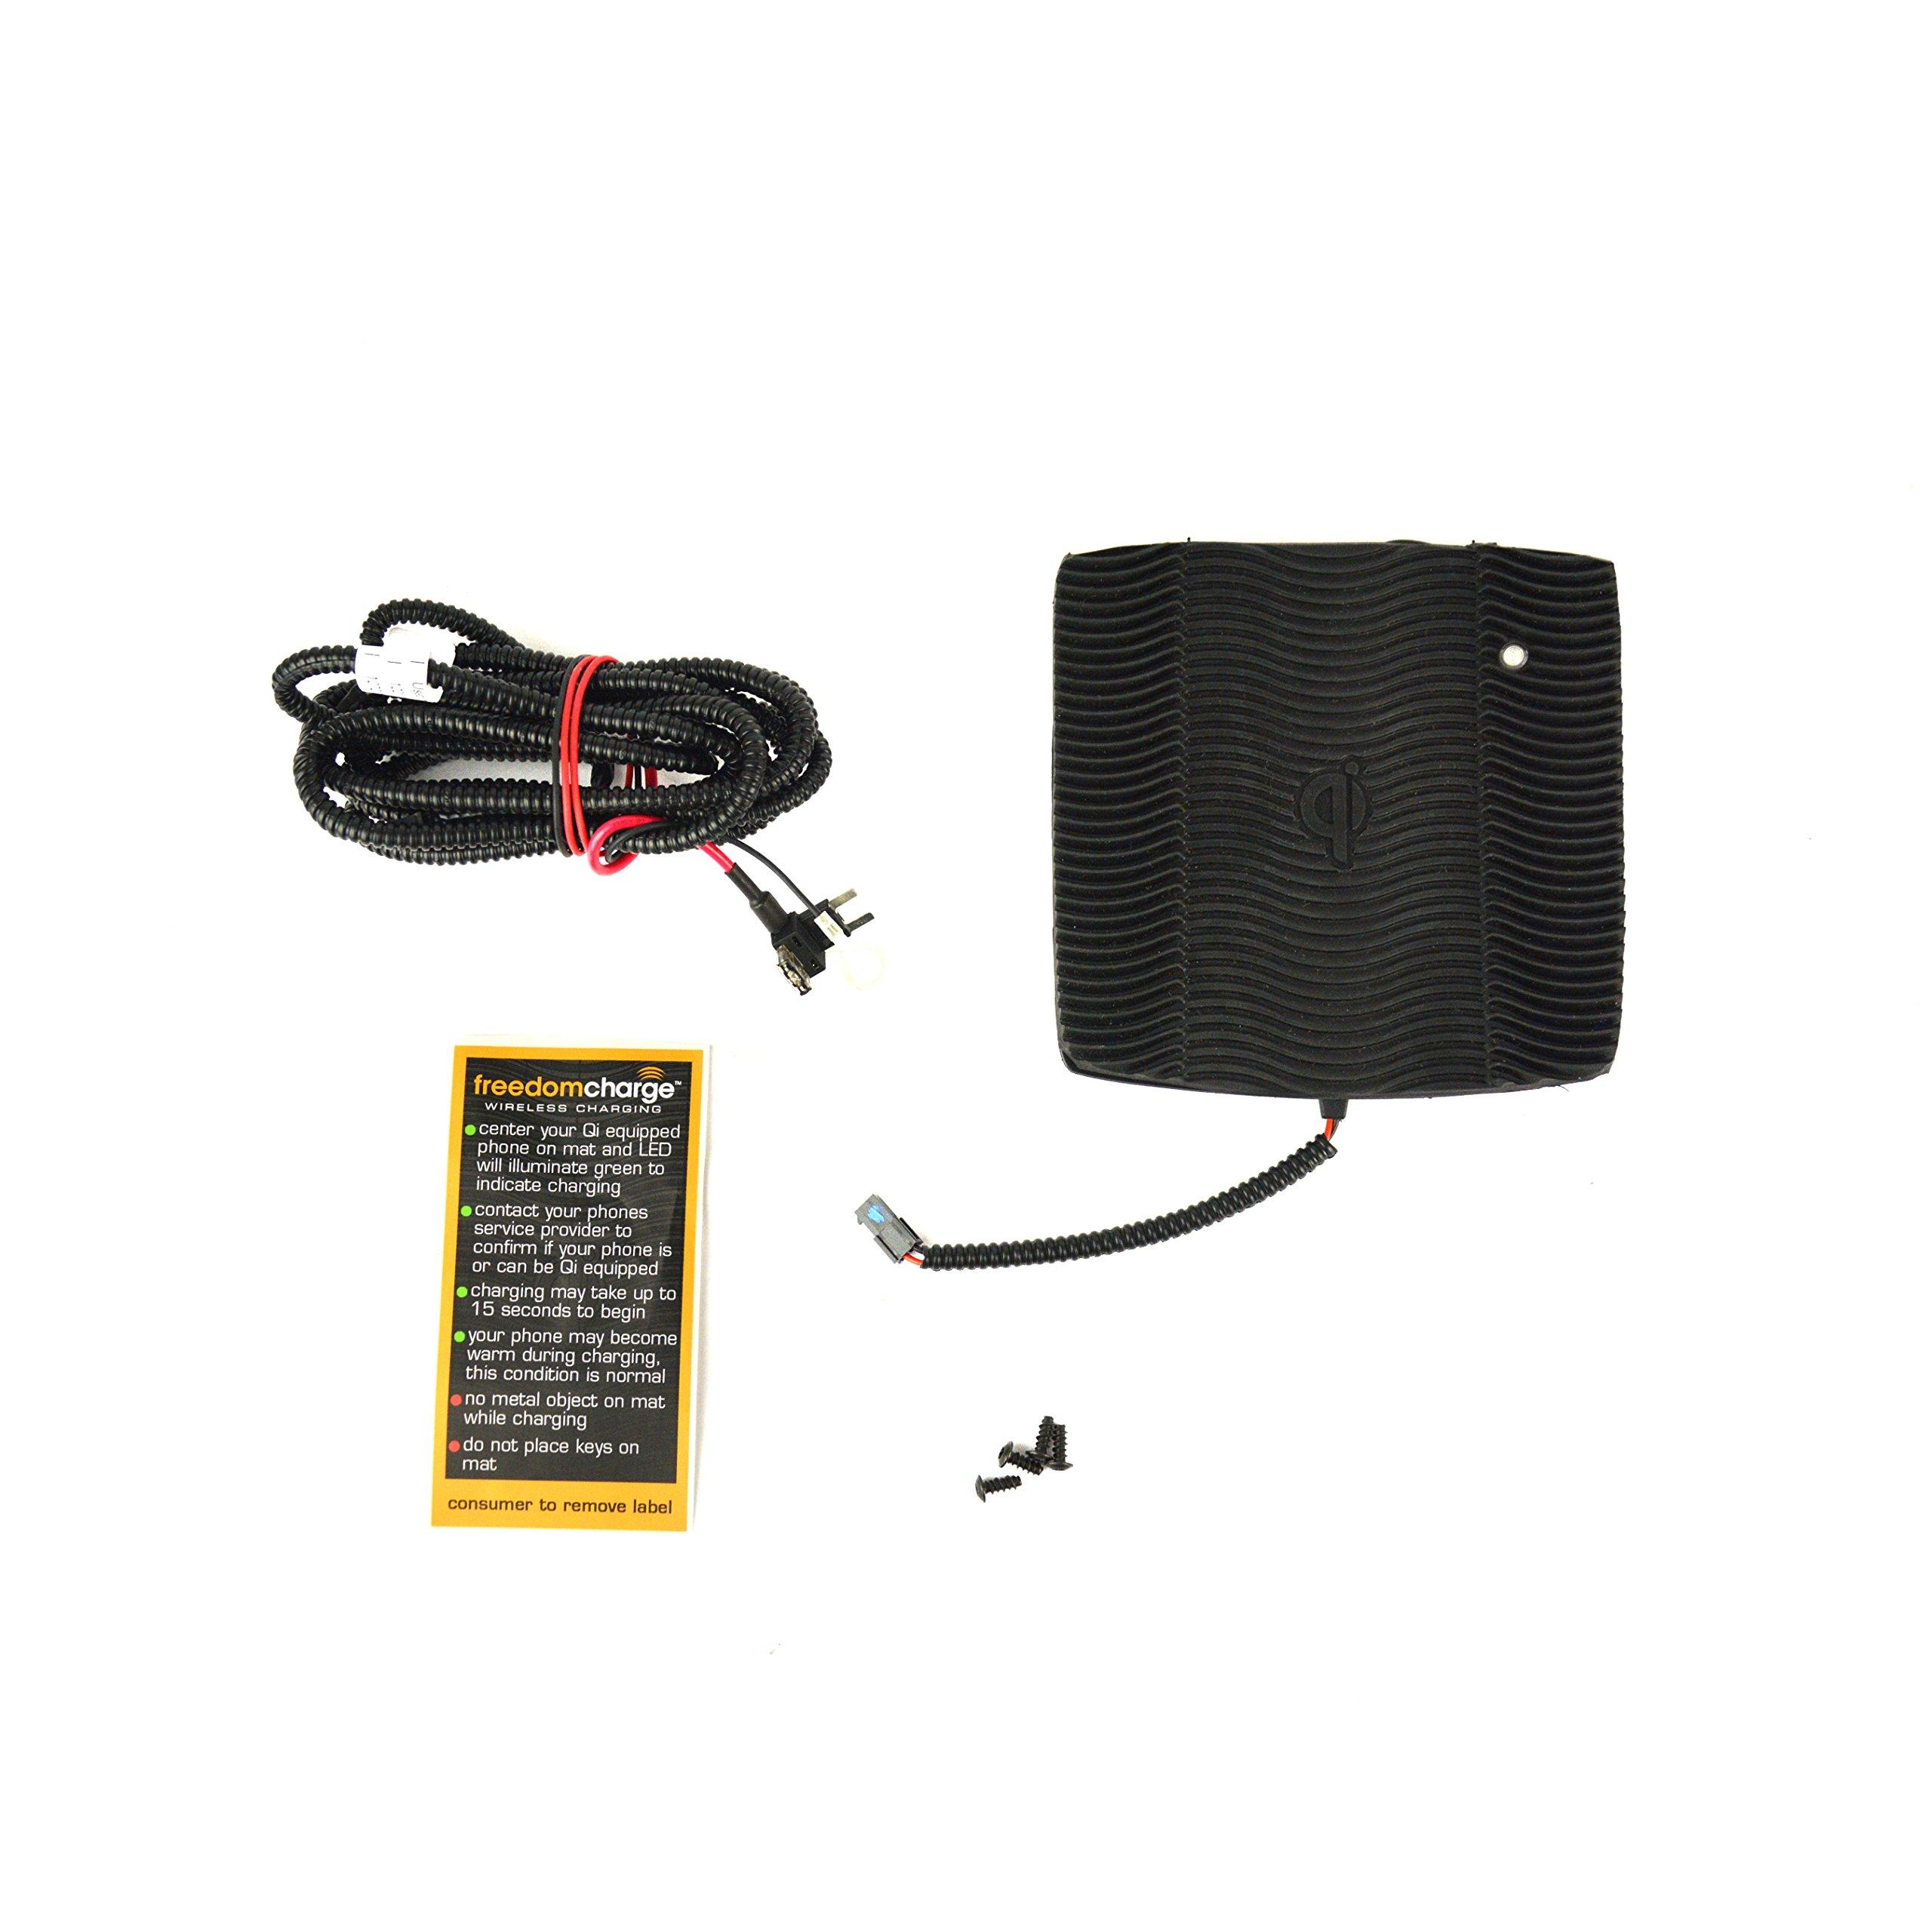 Brandmotion FDMC-1262 Jeep Wrangler Qi Wireless Charging Kit by Brandmotion